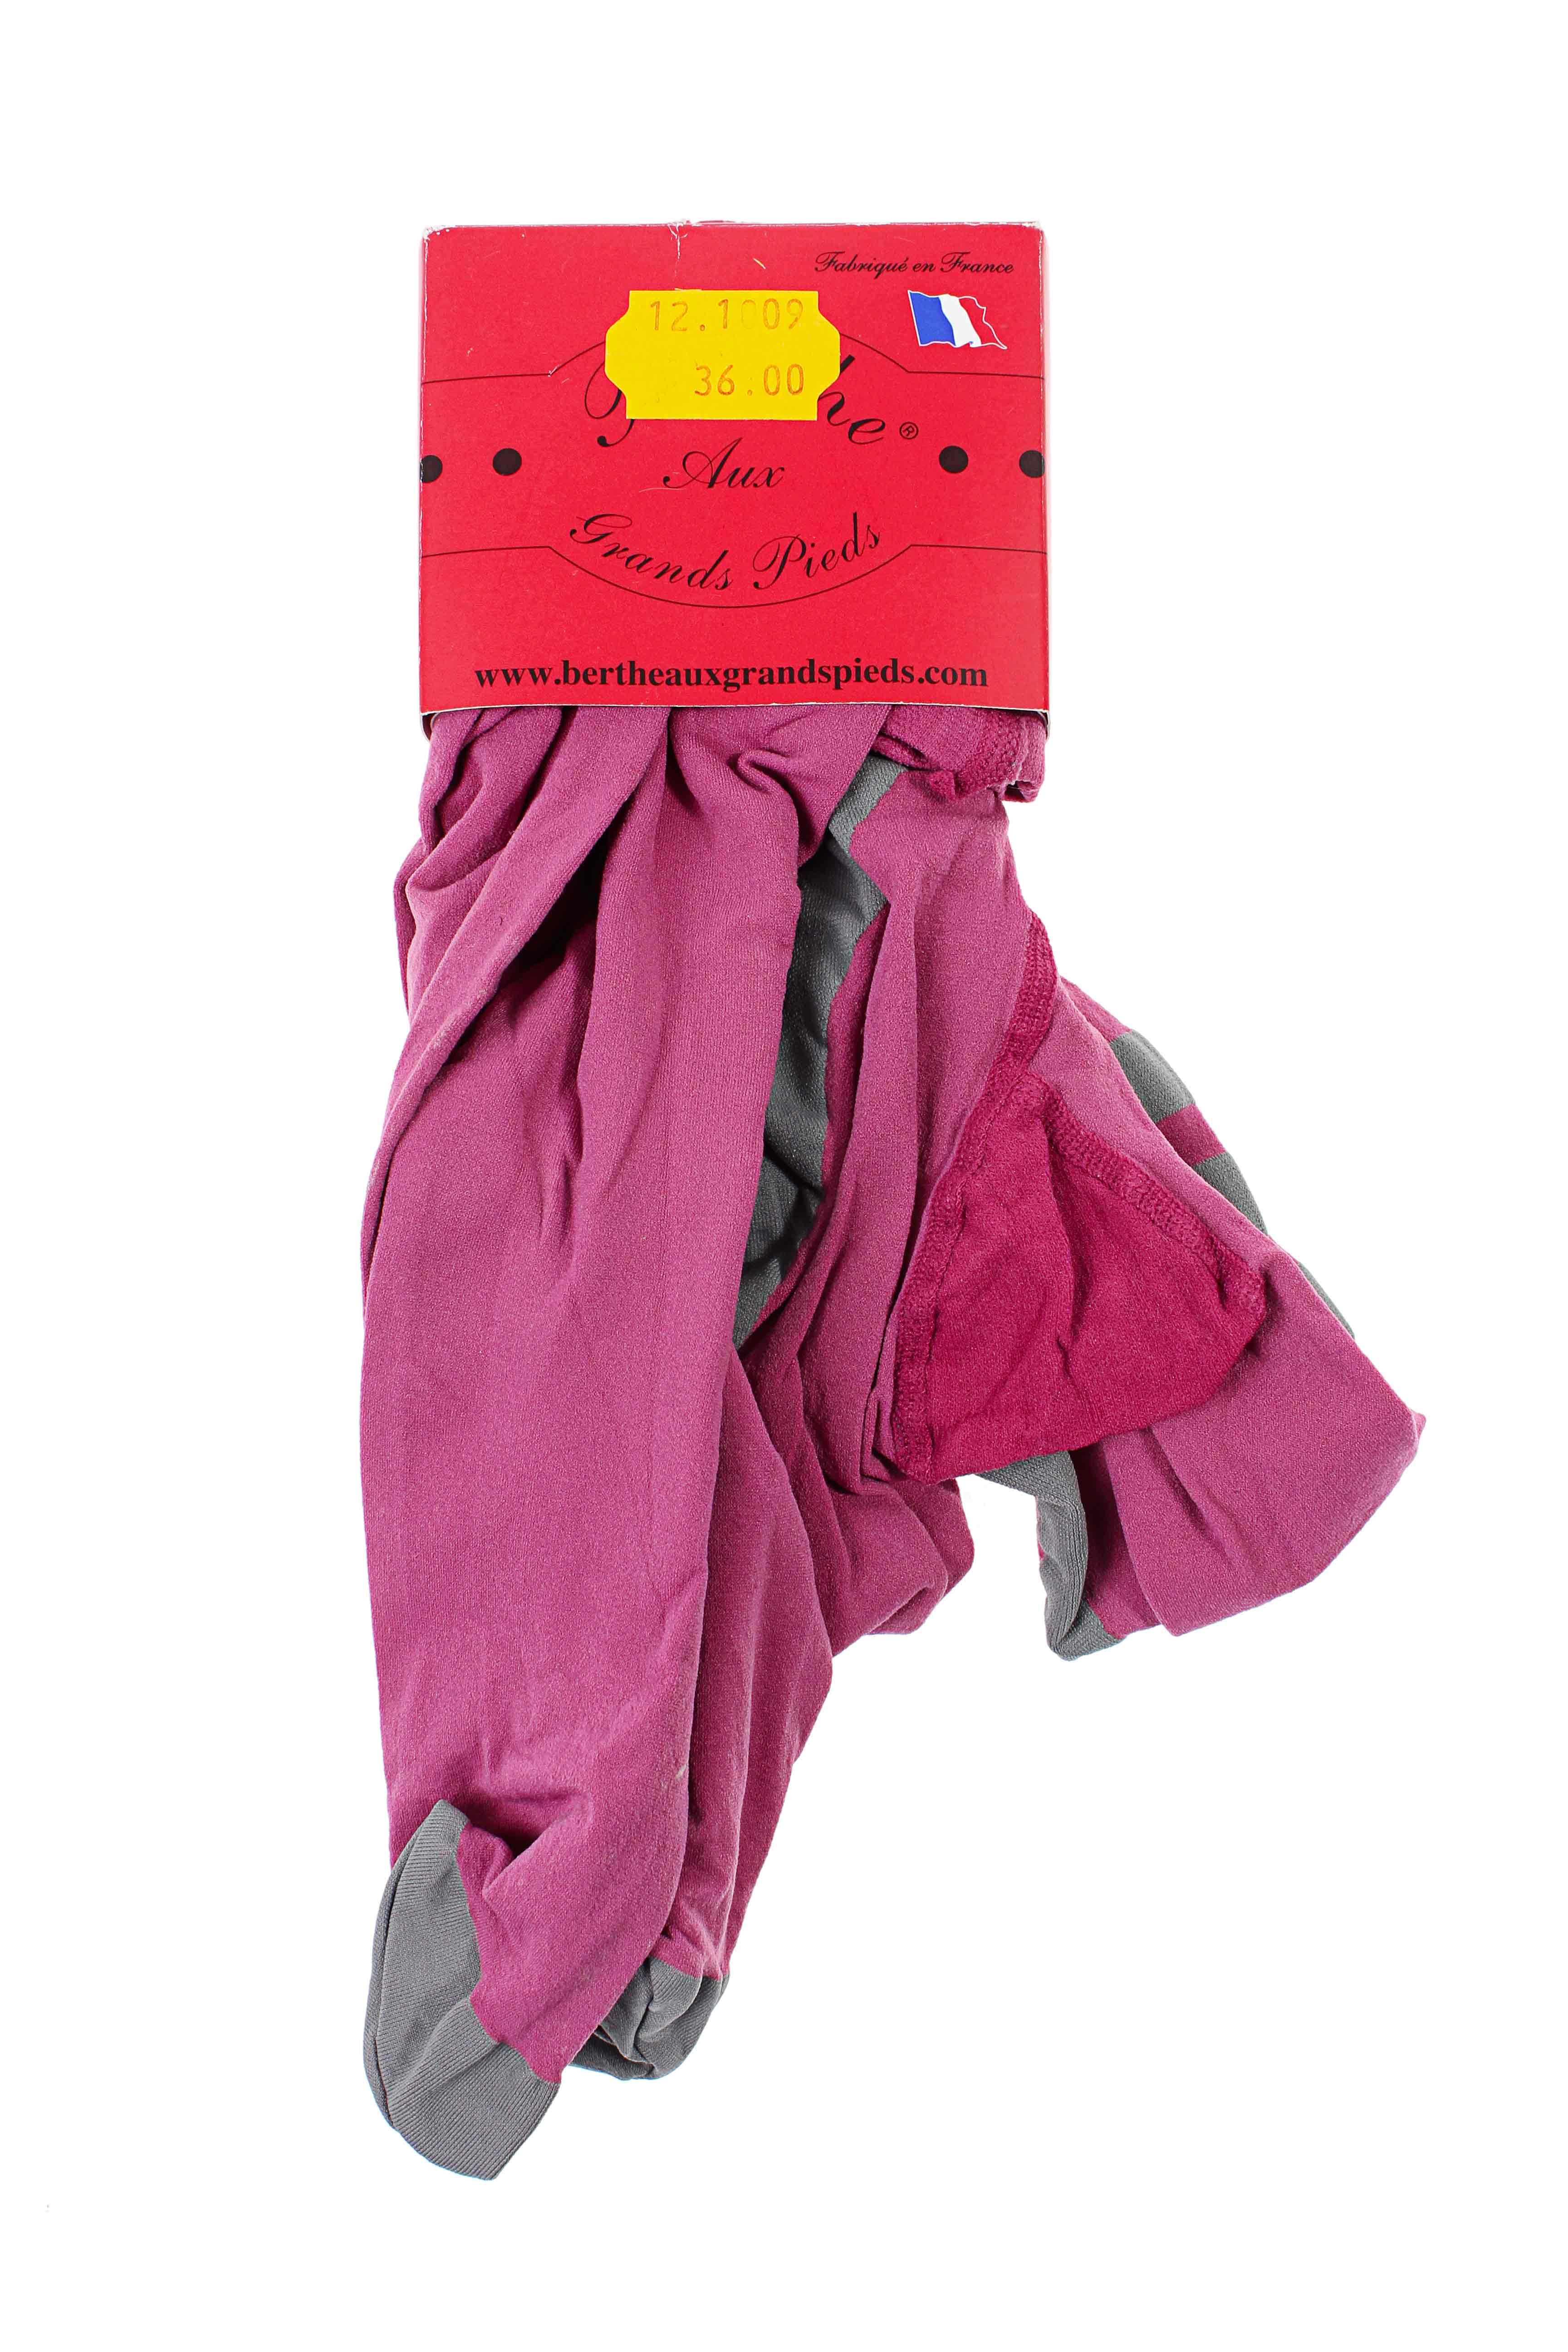 Collants, chaussettes Fille taille 35/37 Kiabi